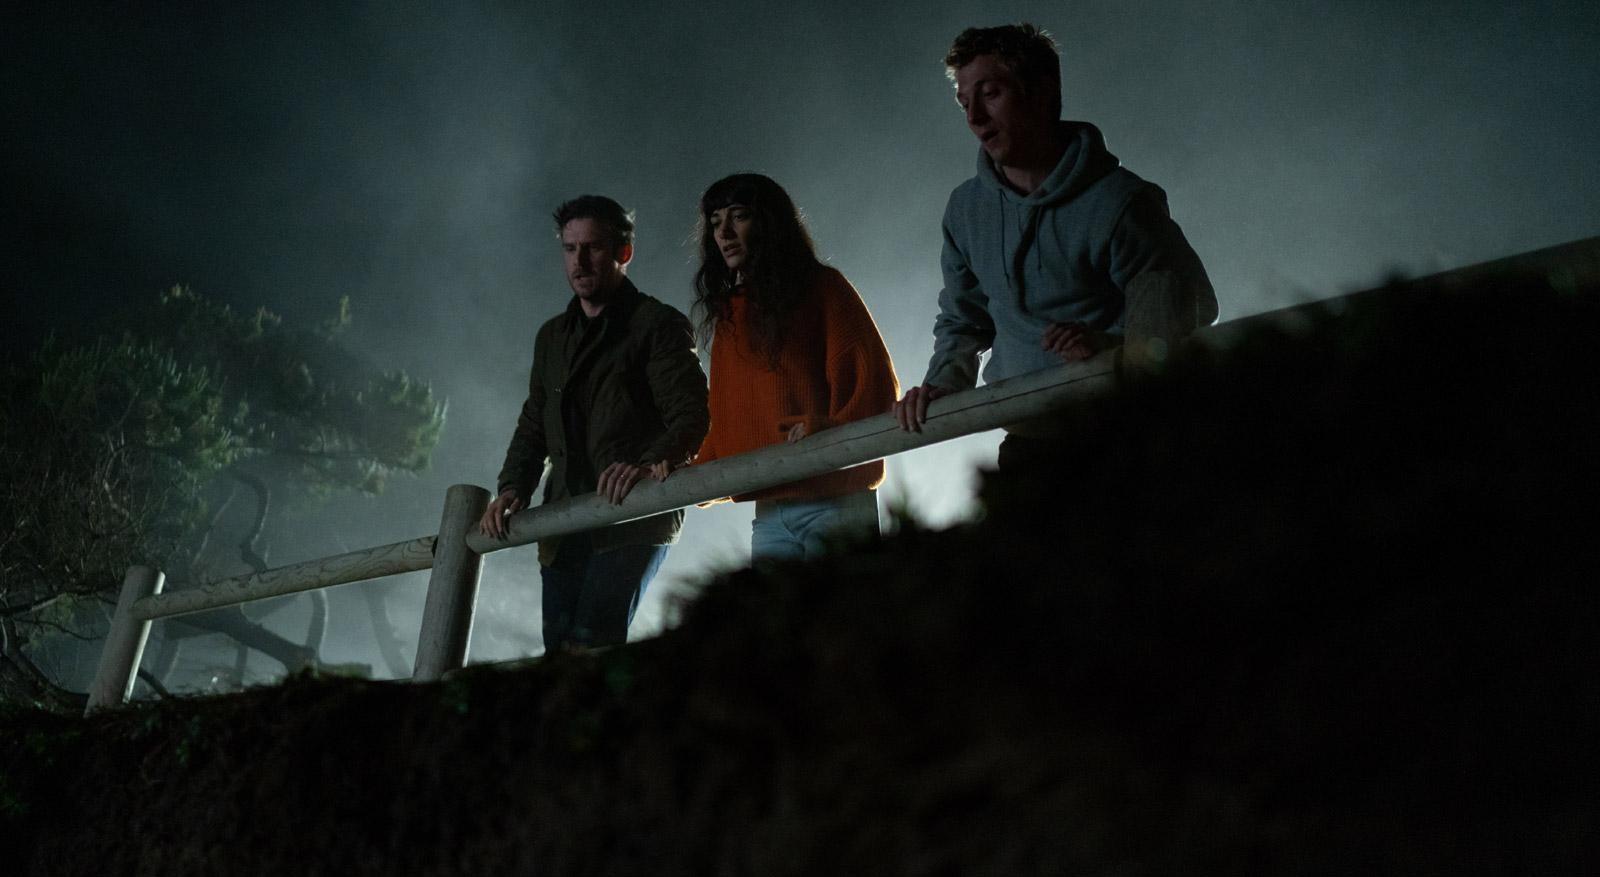 Dan Stevens, Sheila Vand and Jeremy Allen White in The Rental (2020)